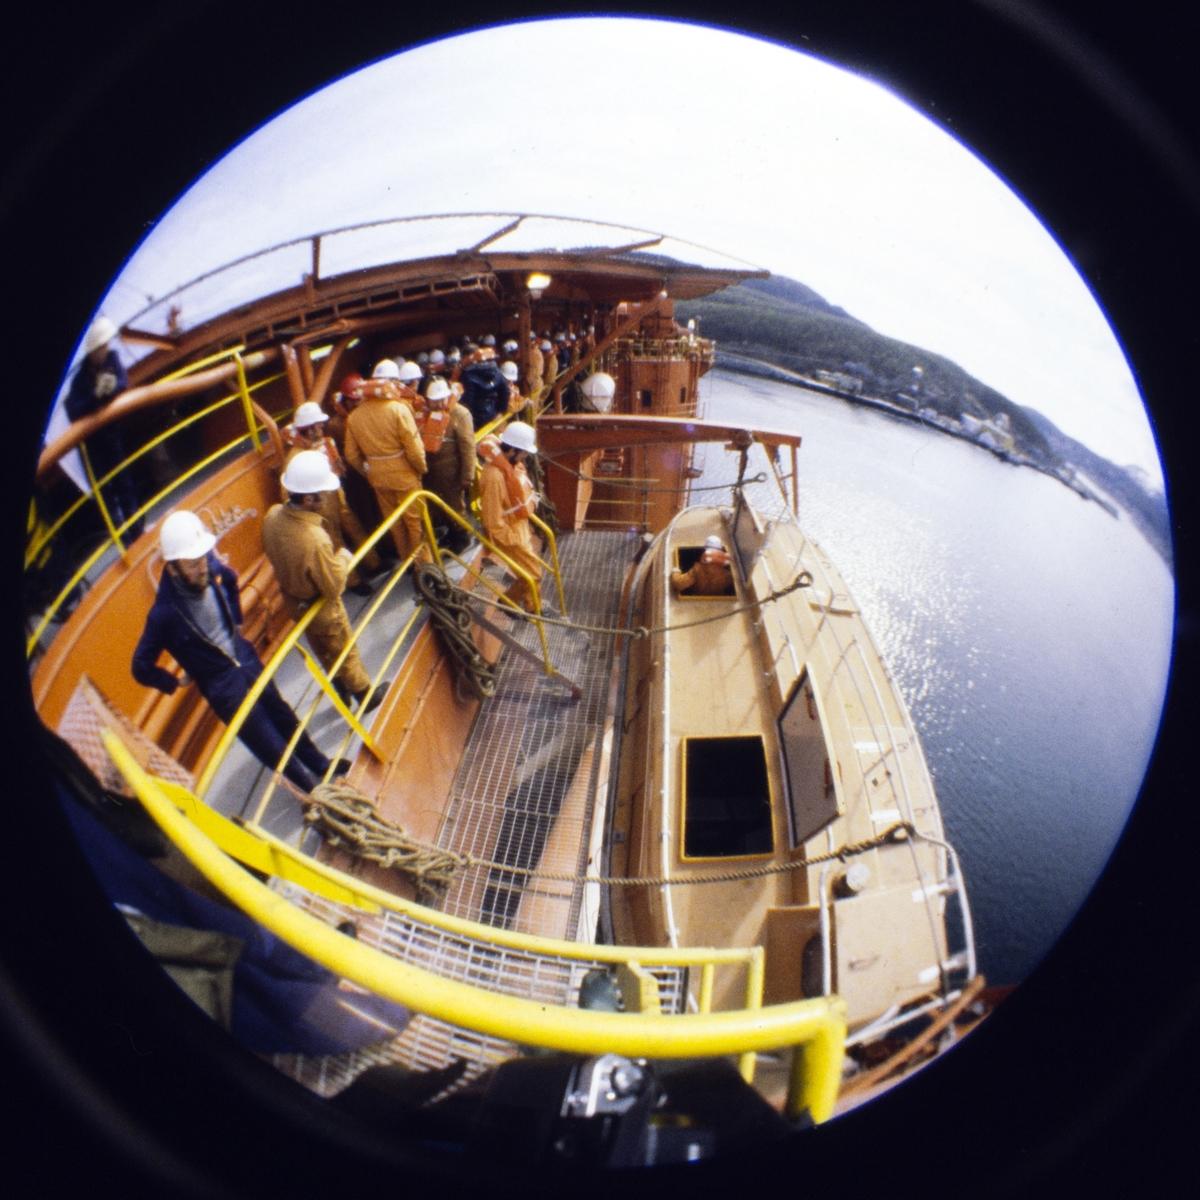 Arbeidere og livbåt på oljeplattform.